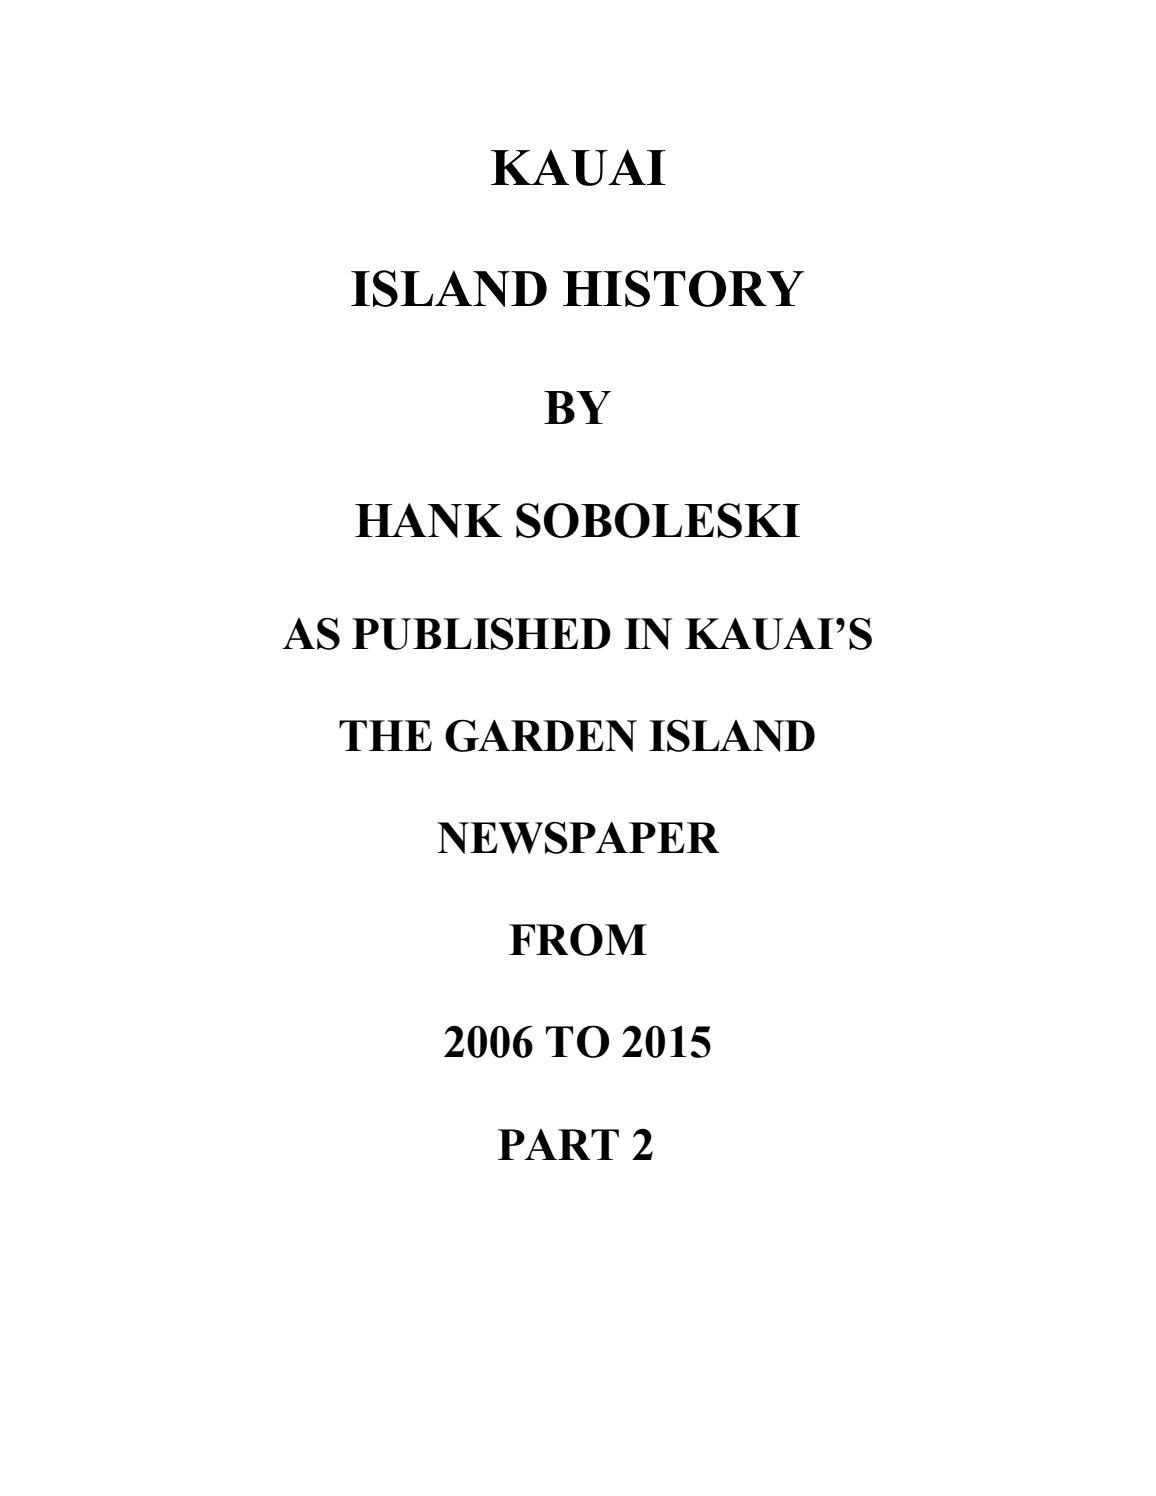 Kauai Island History, part 2 by The Garden Island Newspaper